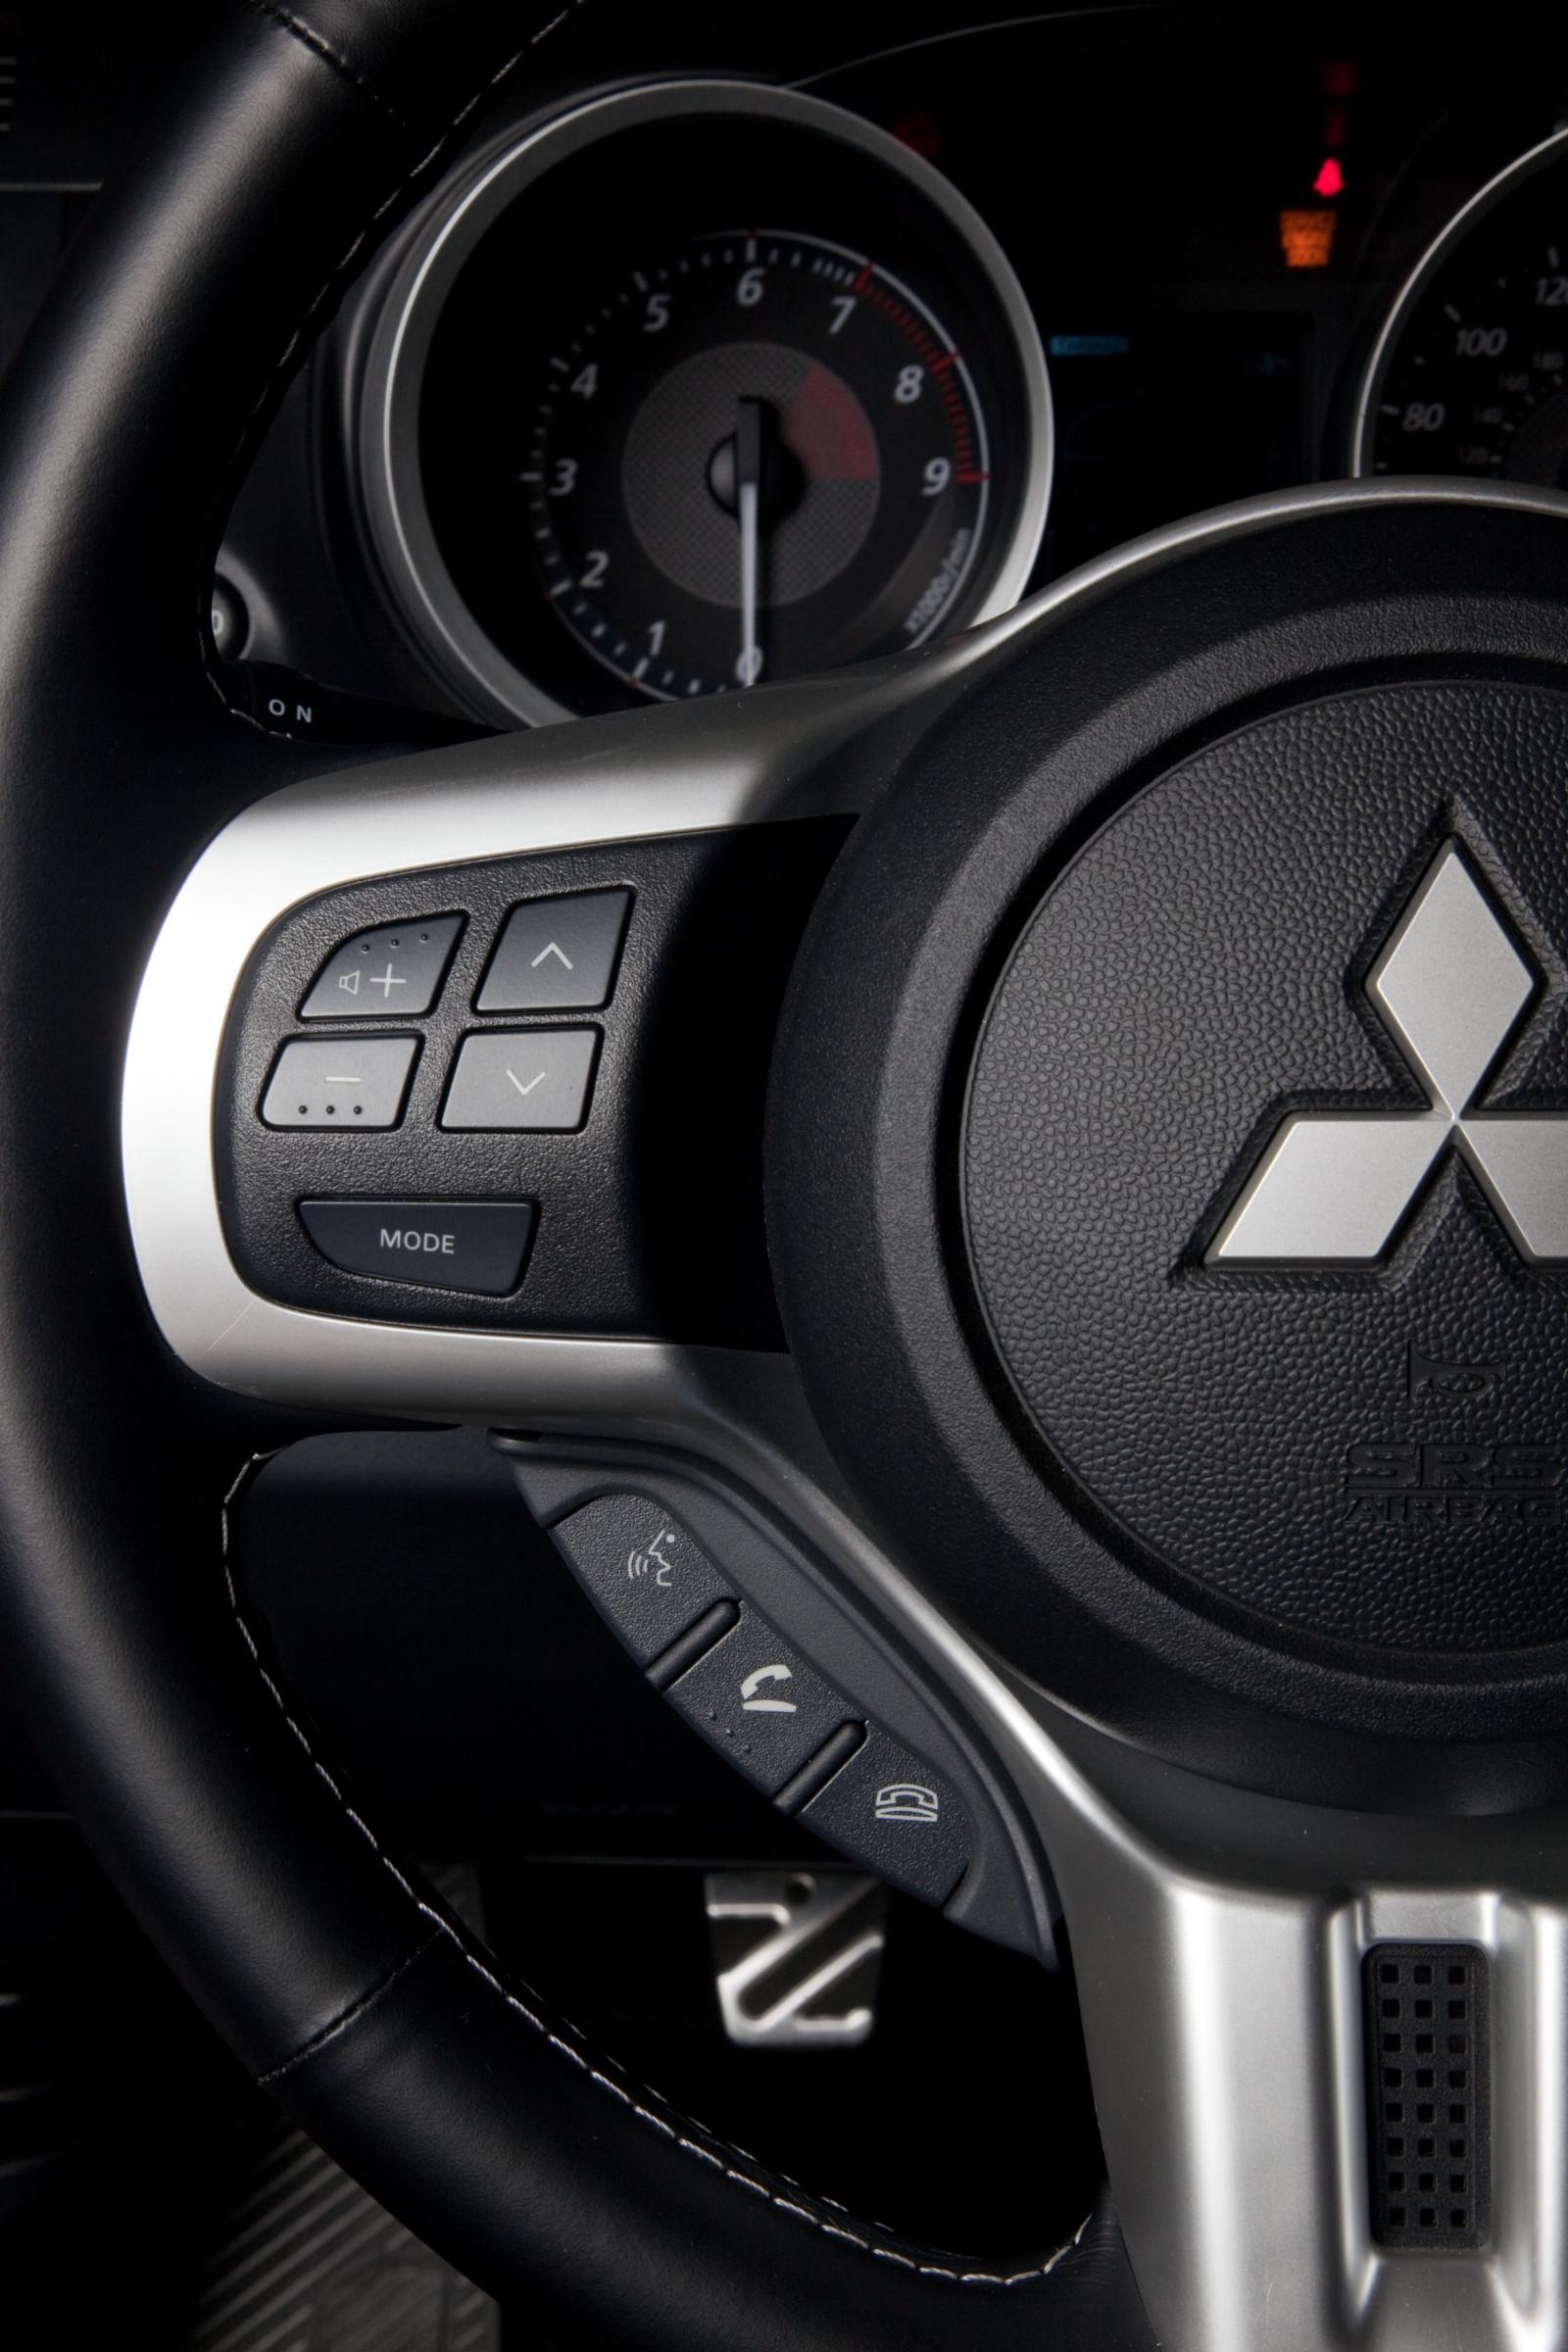 steering mitsubishi lancer evolution vehicle wheel exterior part luxury netcarshow netcar gsr automotive rim automobile utility sedan land sport wallhere